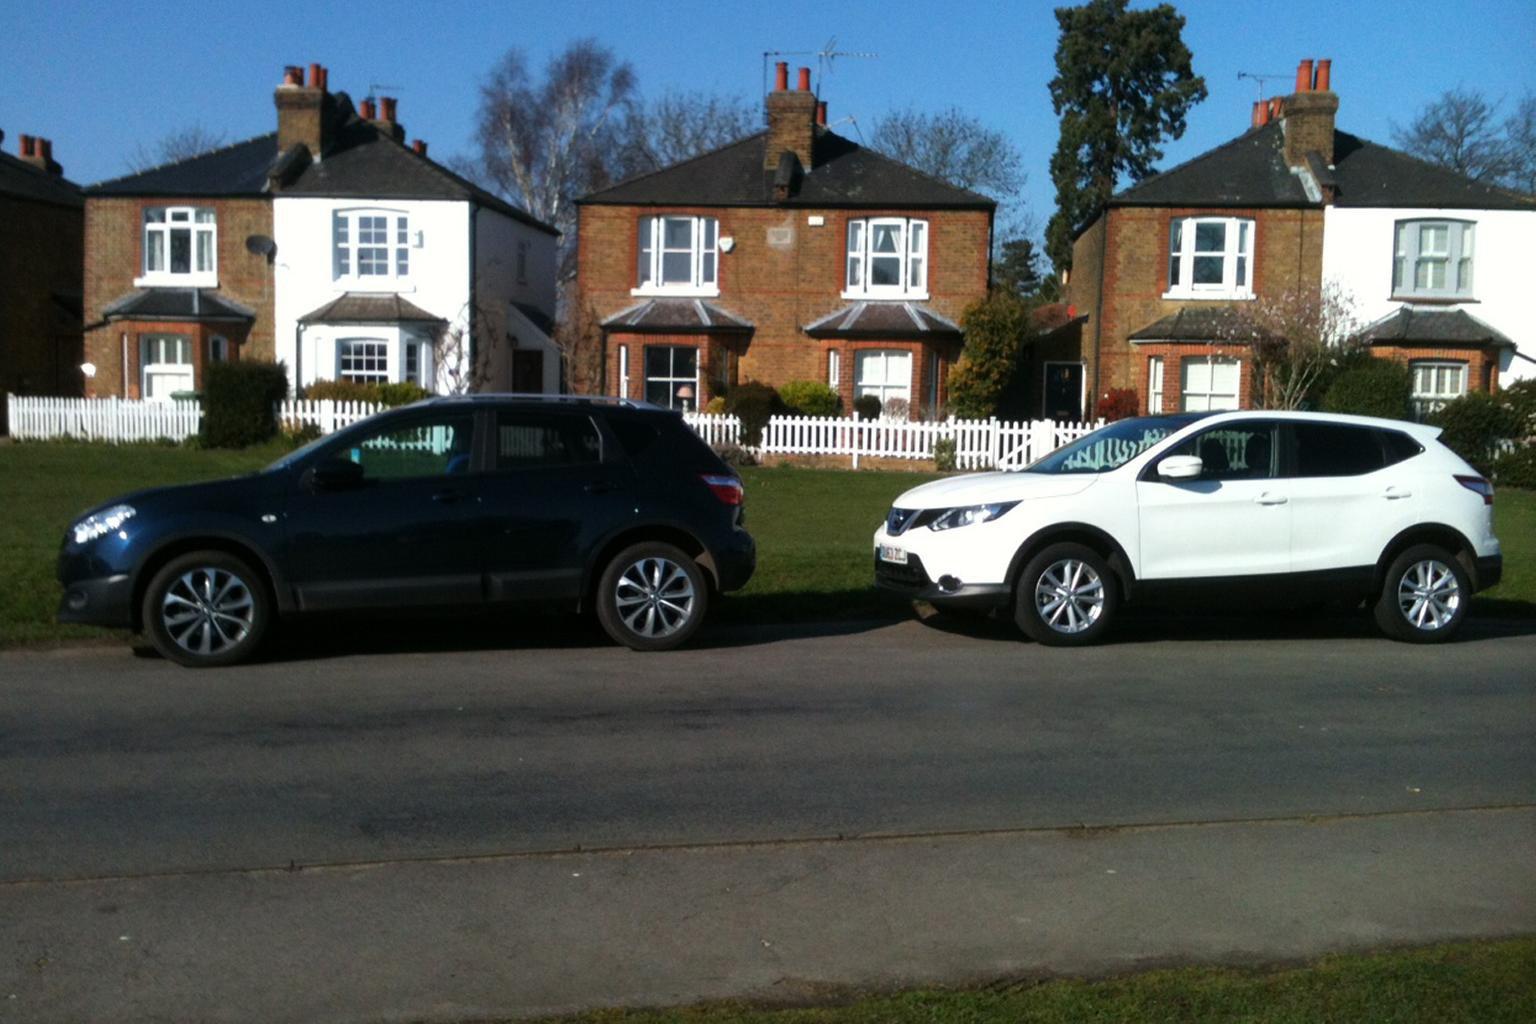 Our cars: Hyundai i10, Kia Carens and Nissan Qashqai